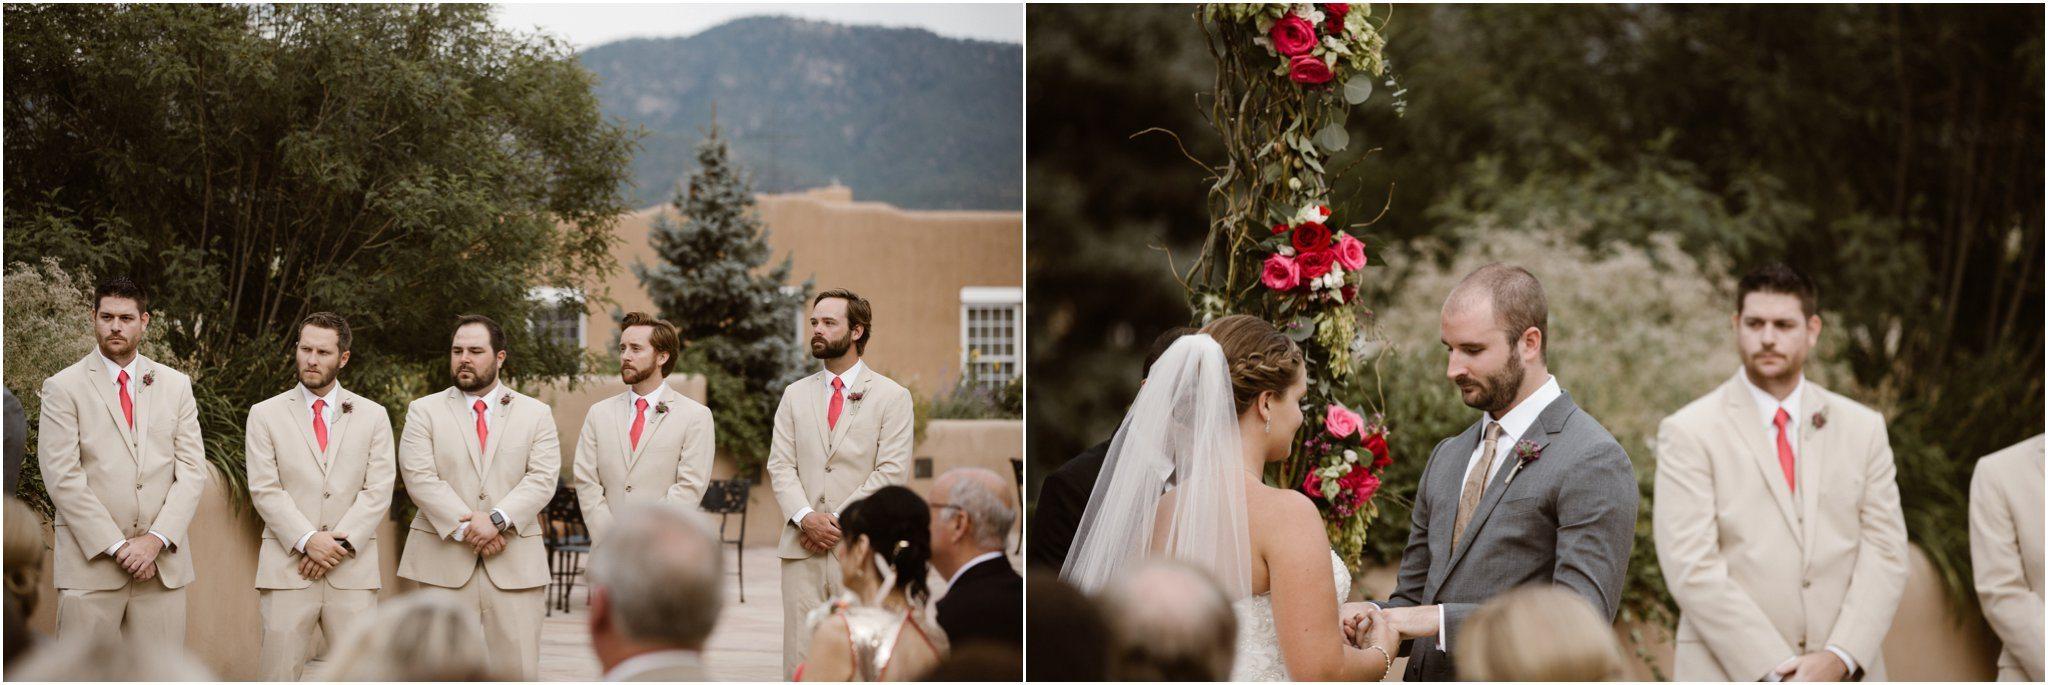 0039albuquerque-wedding-photographer_-santa-fe-wedding-photographer_-southwest-wedding-photography_-blue-rose-studio